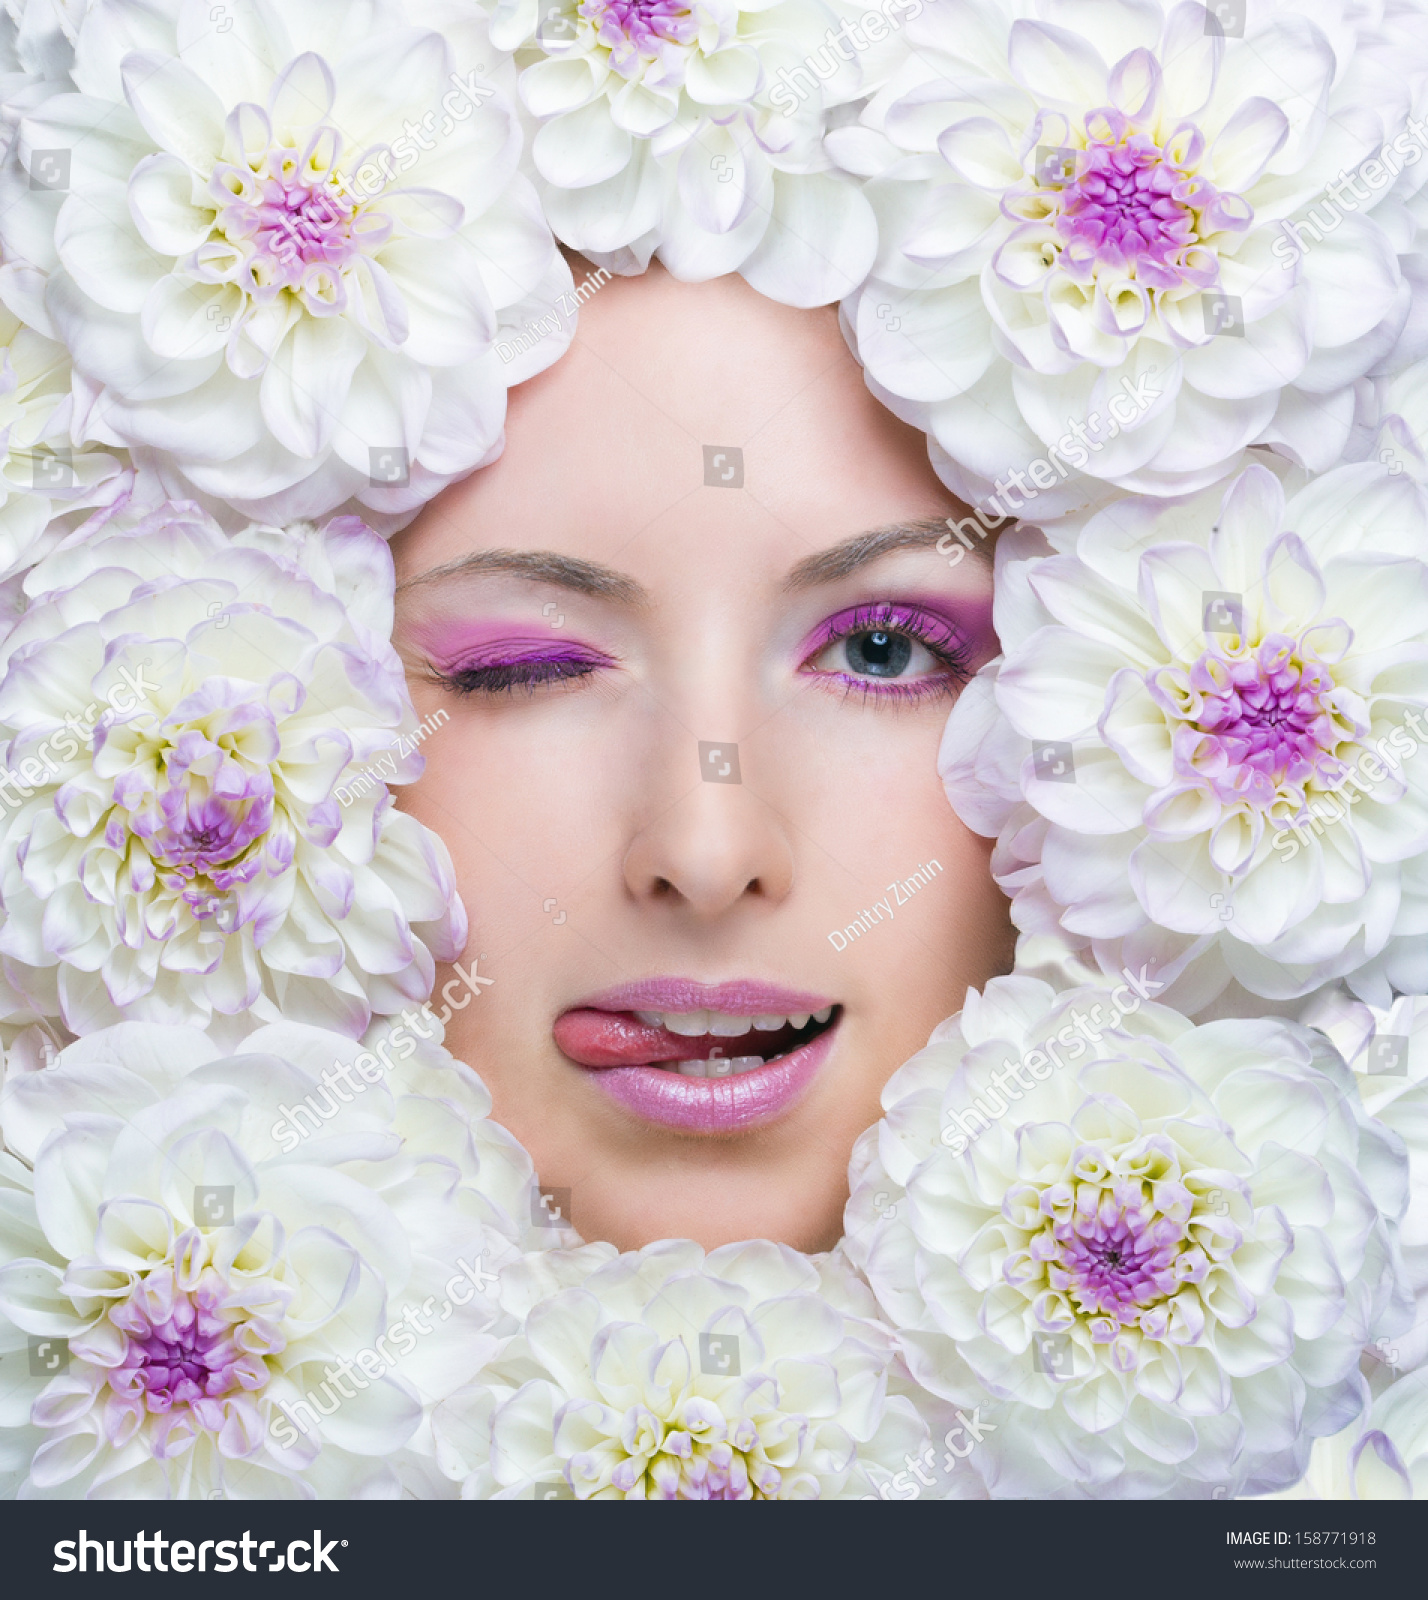 Beauty girl white flowers around her stock photo 158771918 beauty girl with white flowers around her face dahlia flowers beautiful makeup beauty izmirmasajfo Image collections